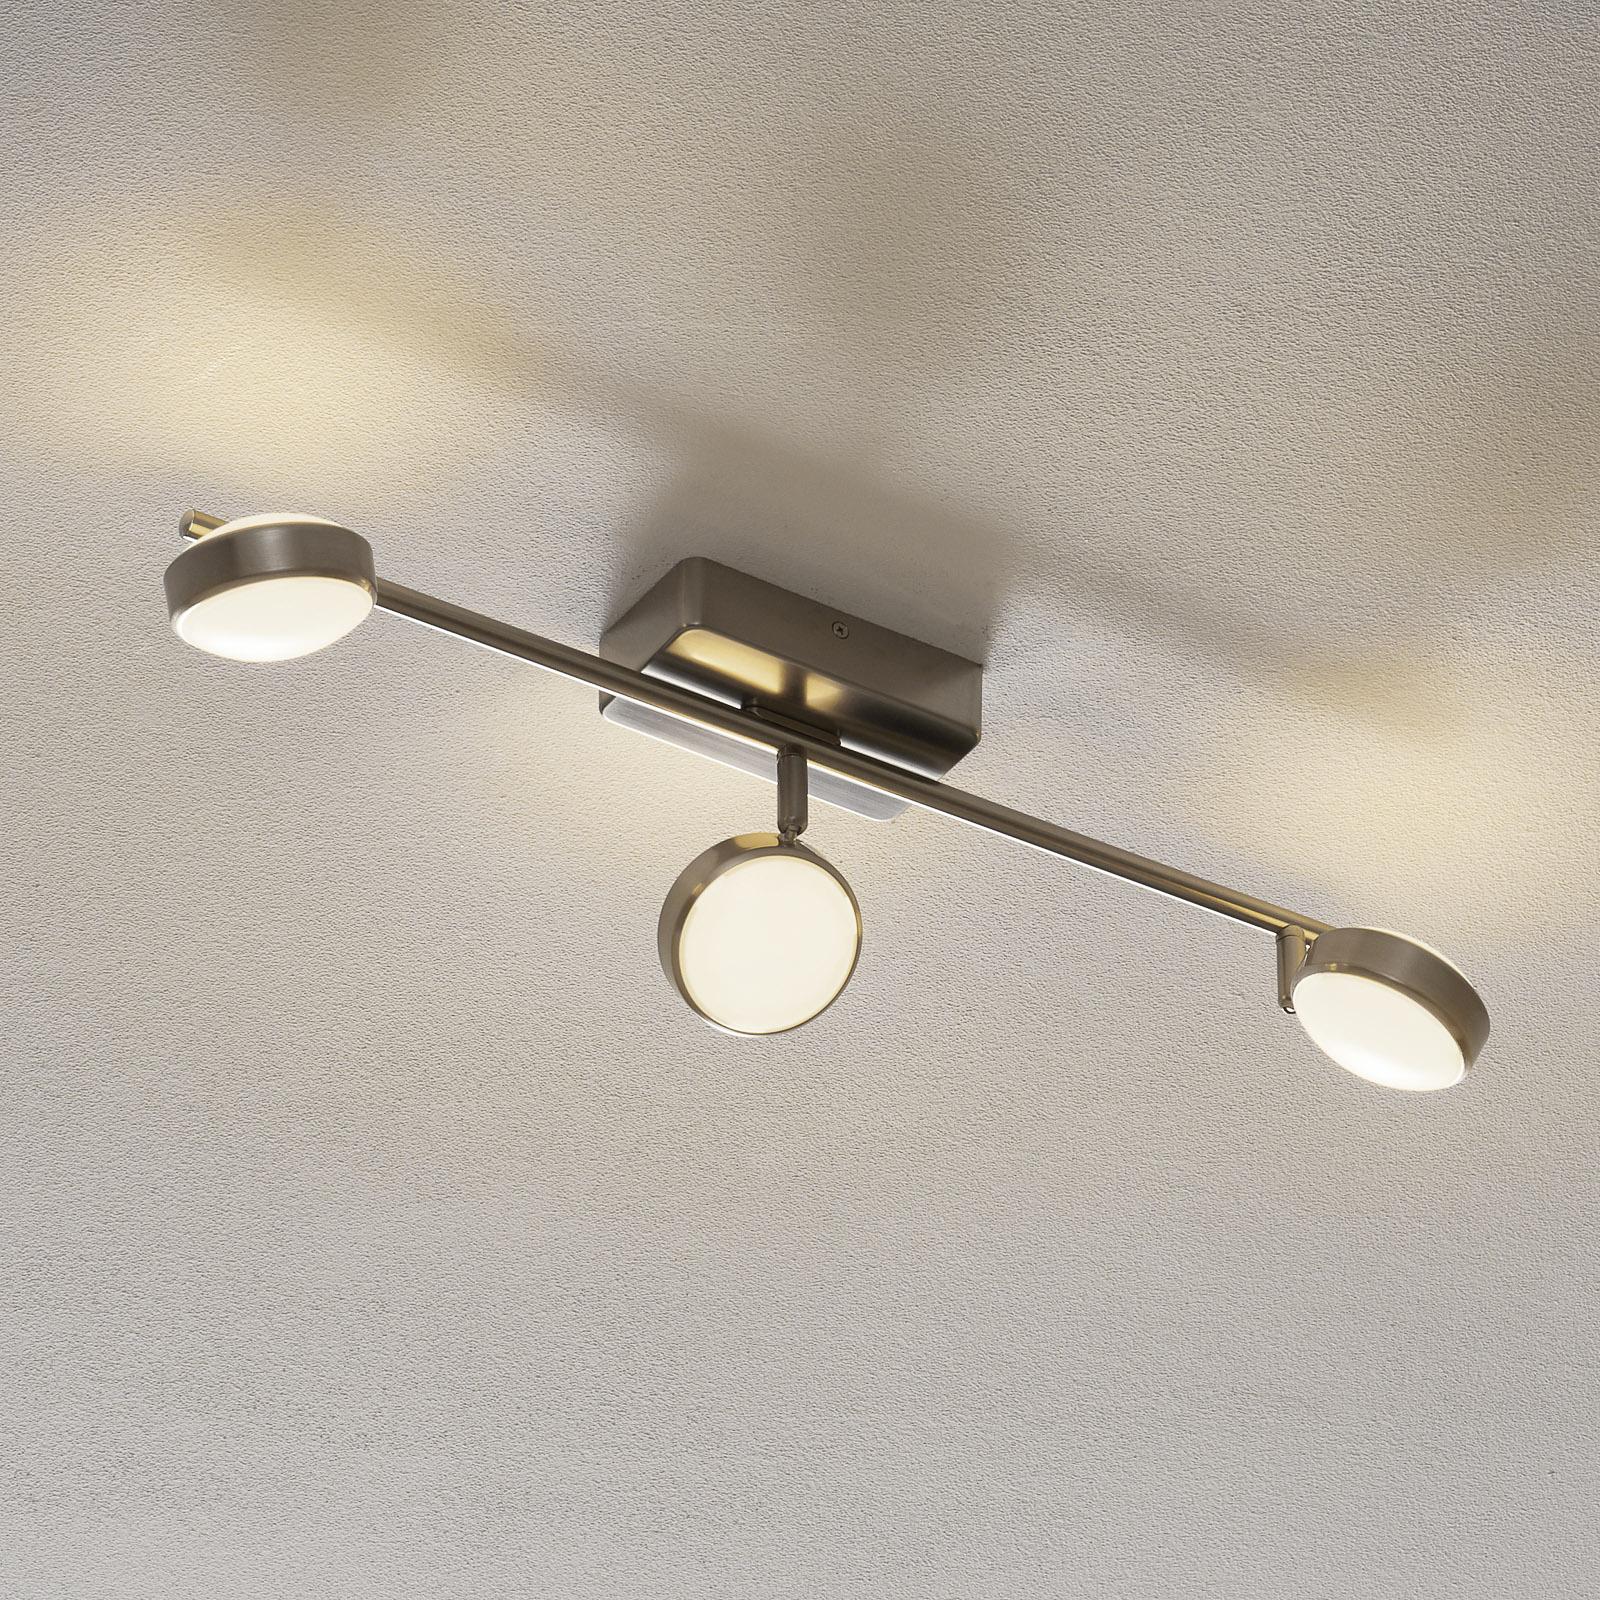 EGLO connect Corropoli-C LED-loftspot, 3 lyskilder